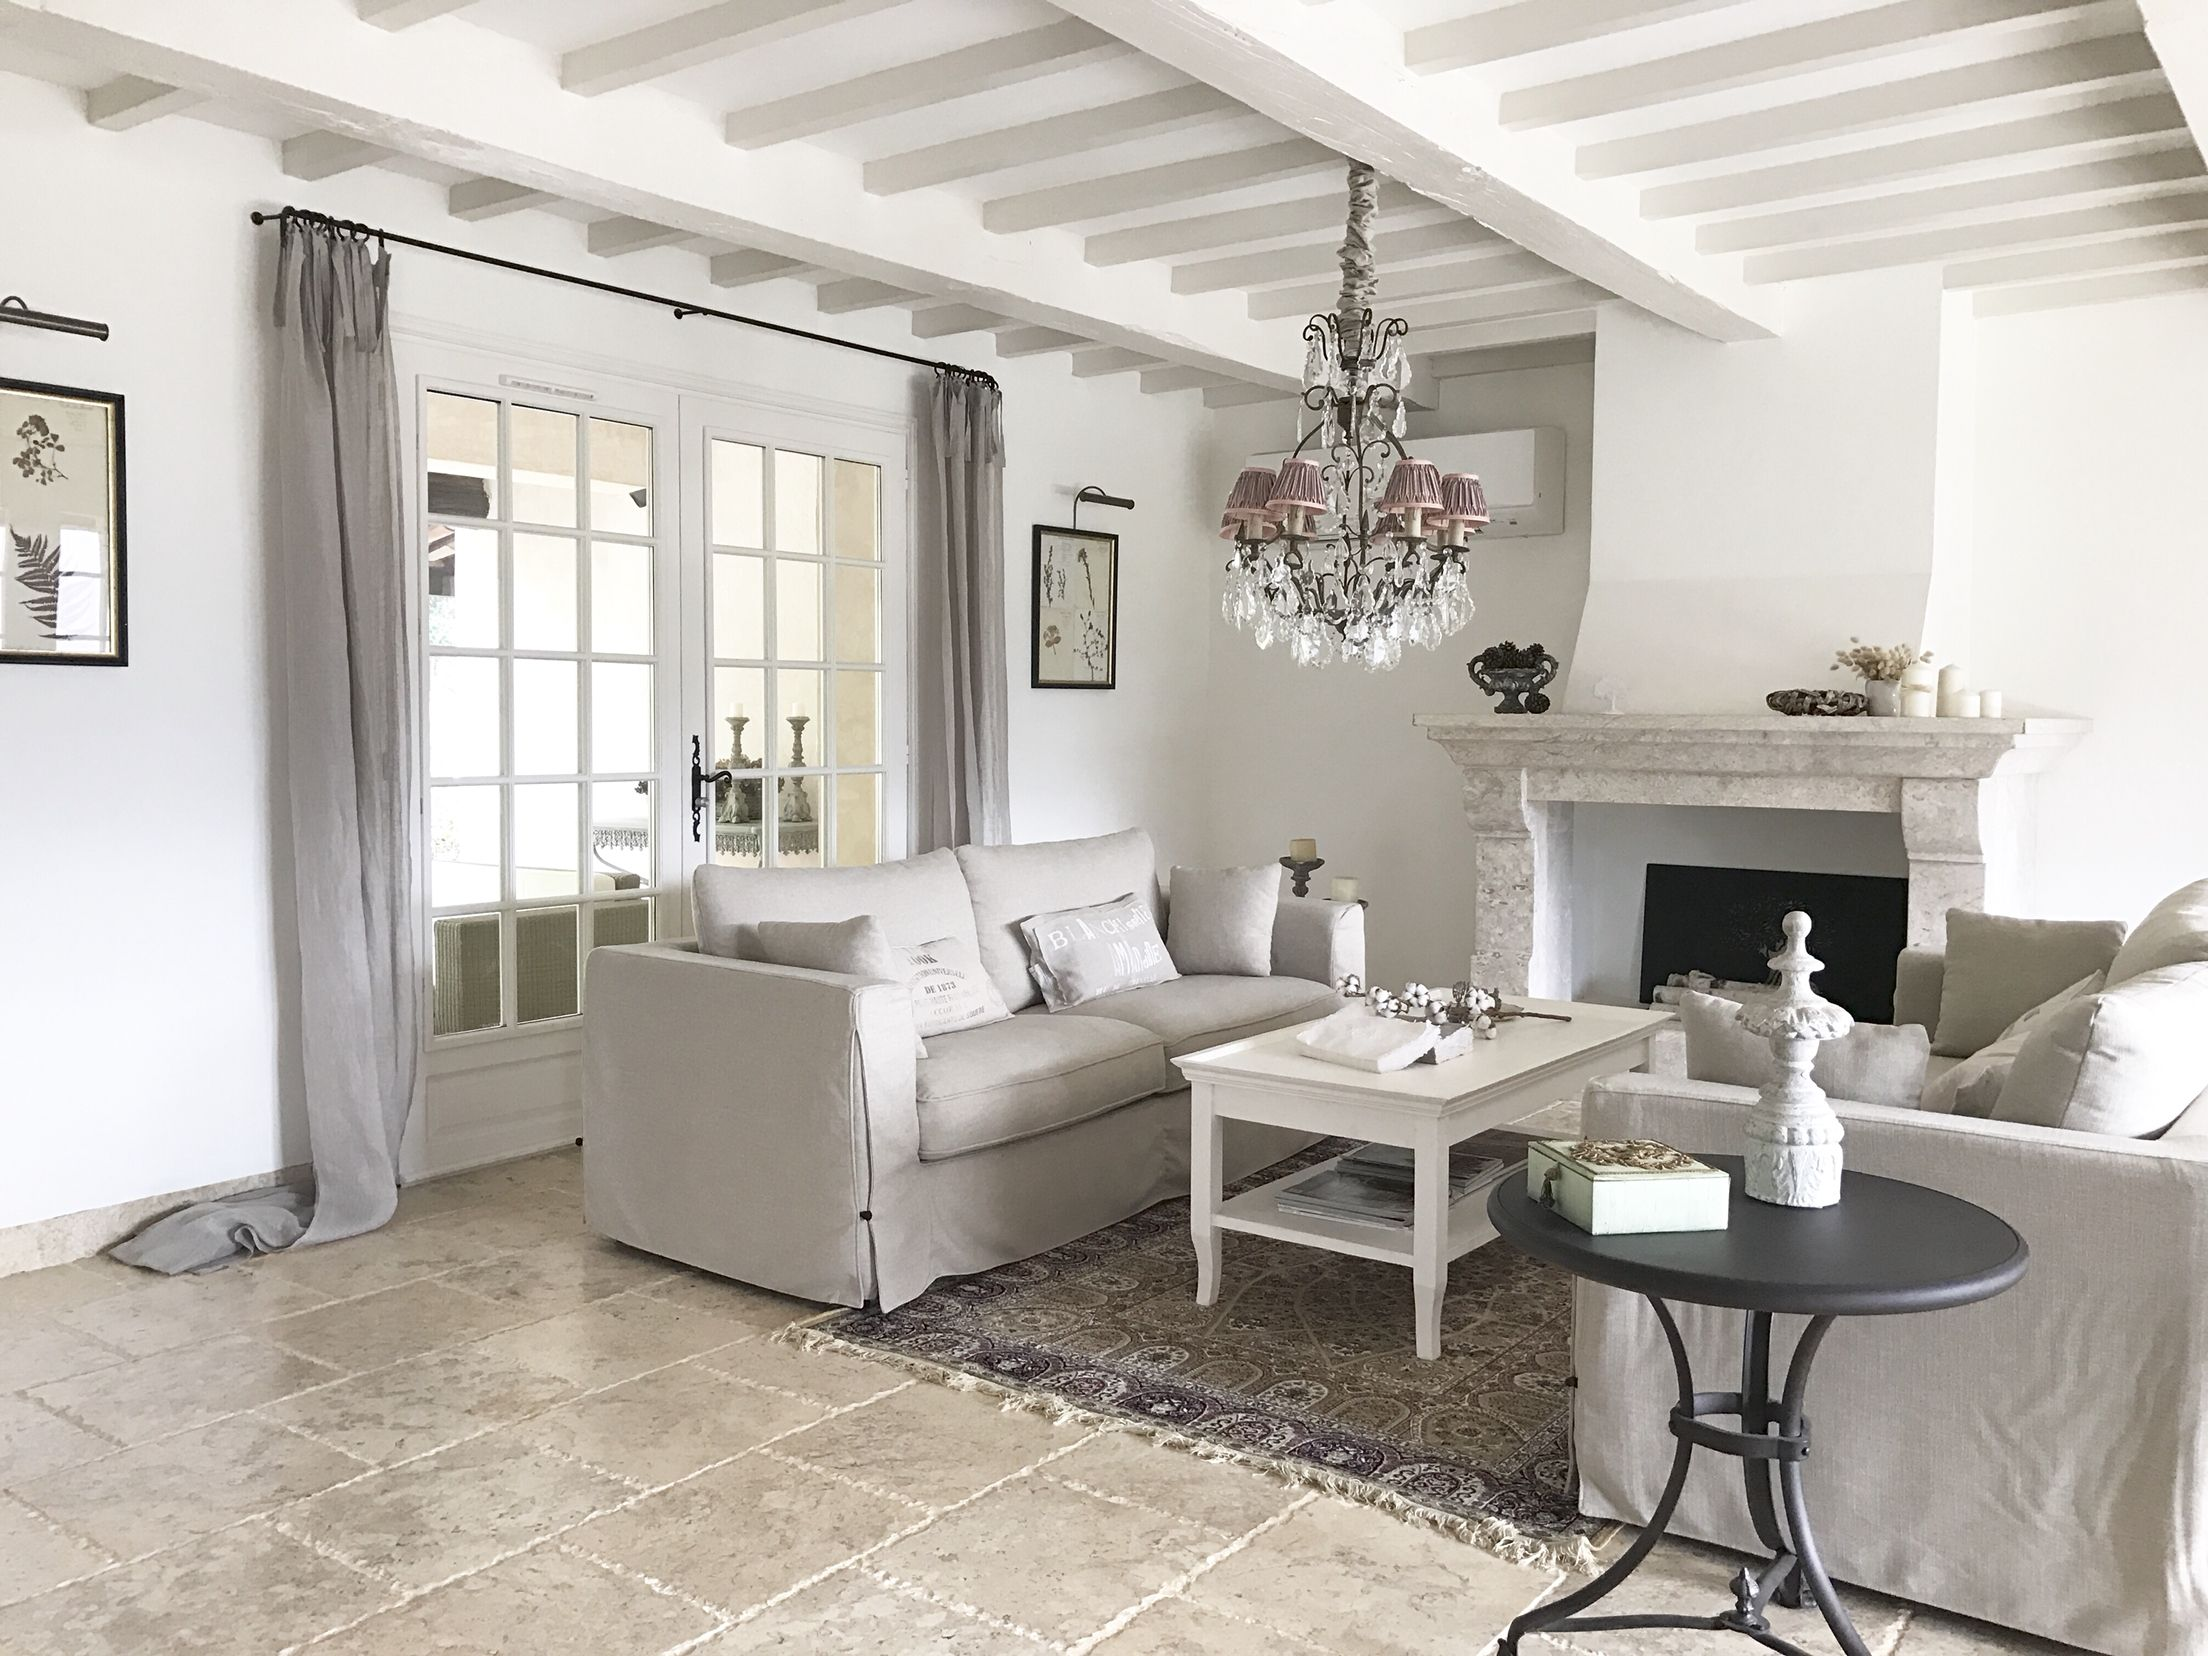 Provence interiors in Khaoyai Provence interiors